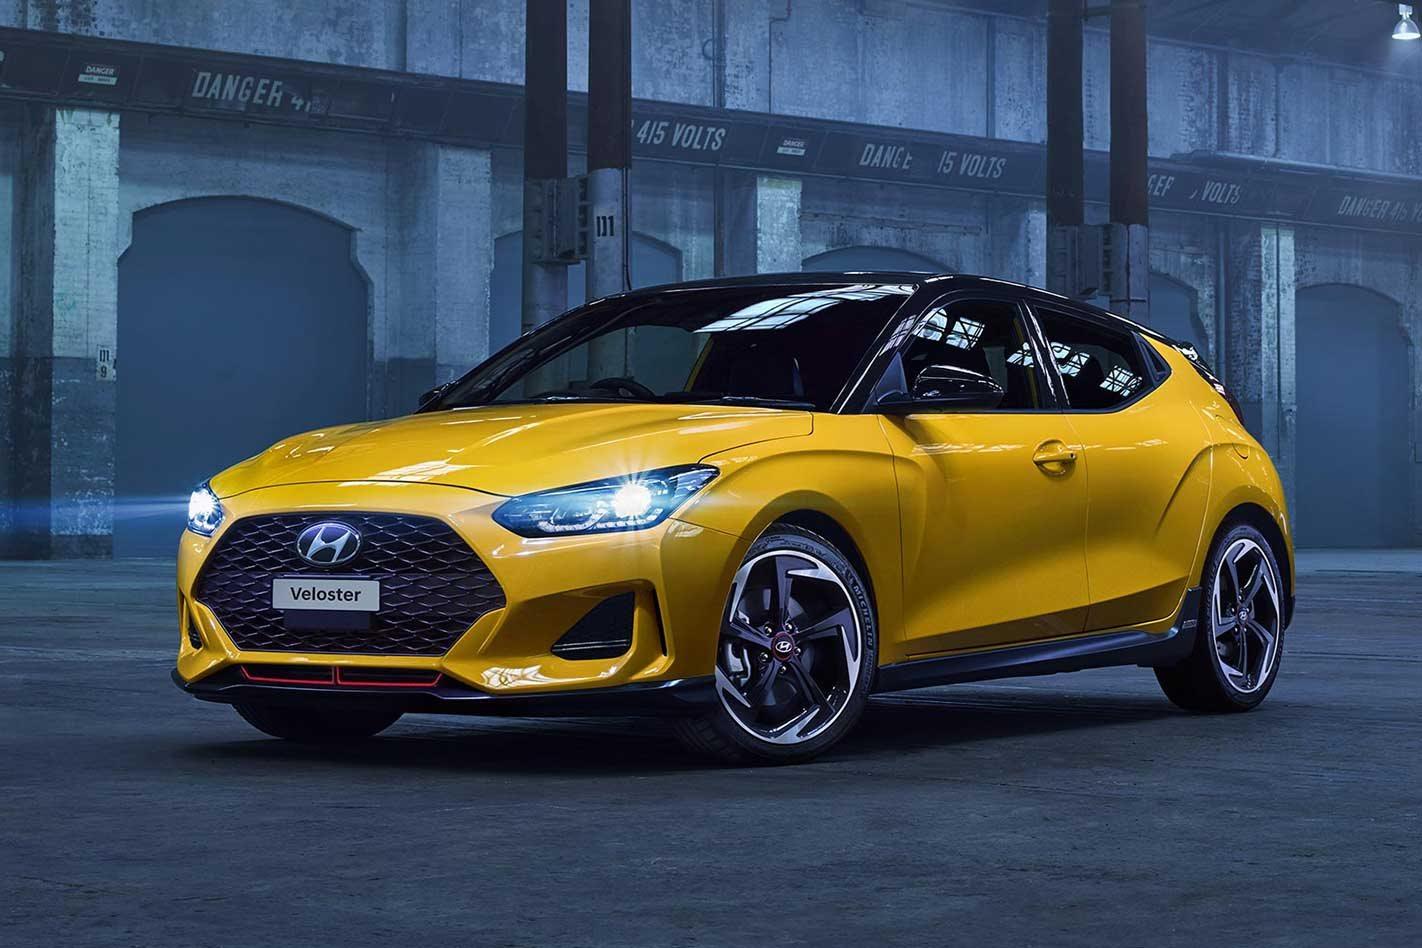 2020 Hyundai Veloster Turbo Australian pricing and specs